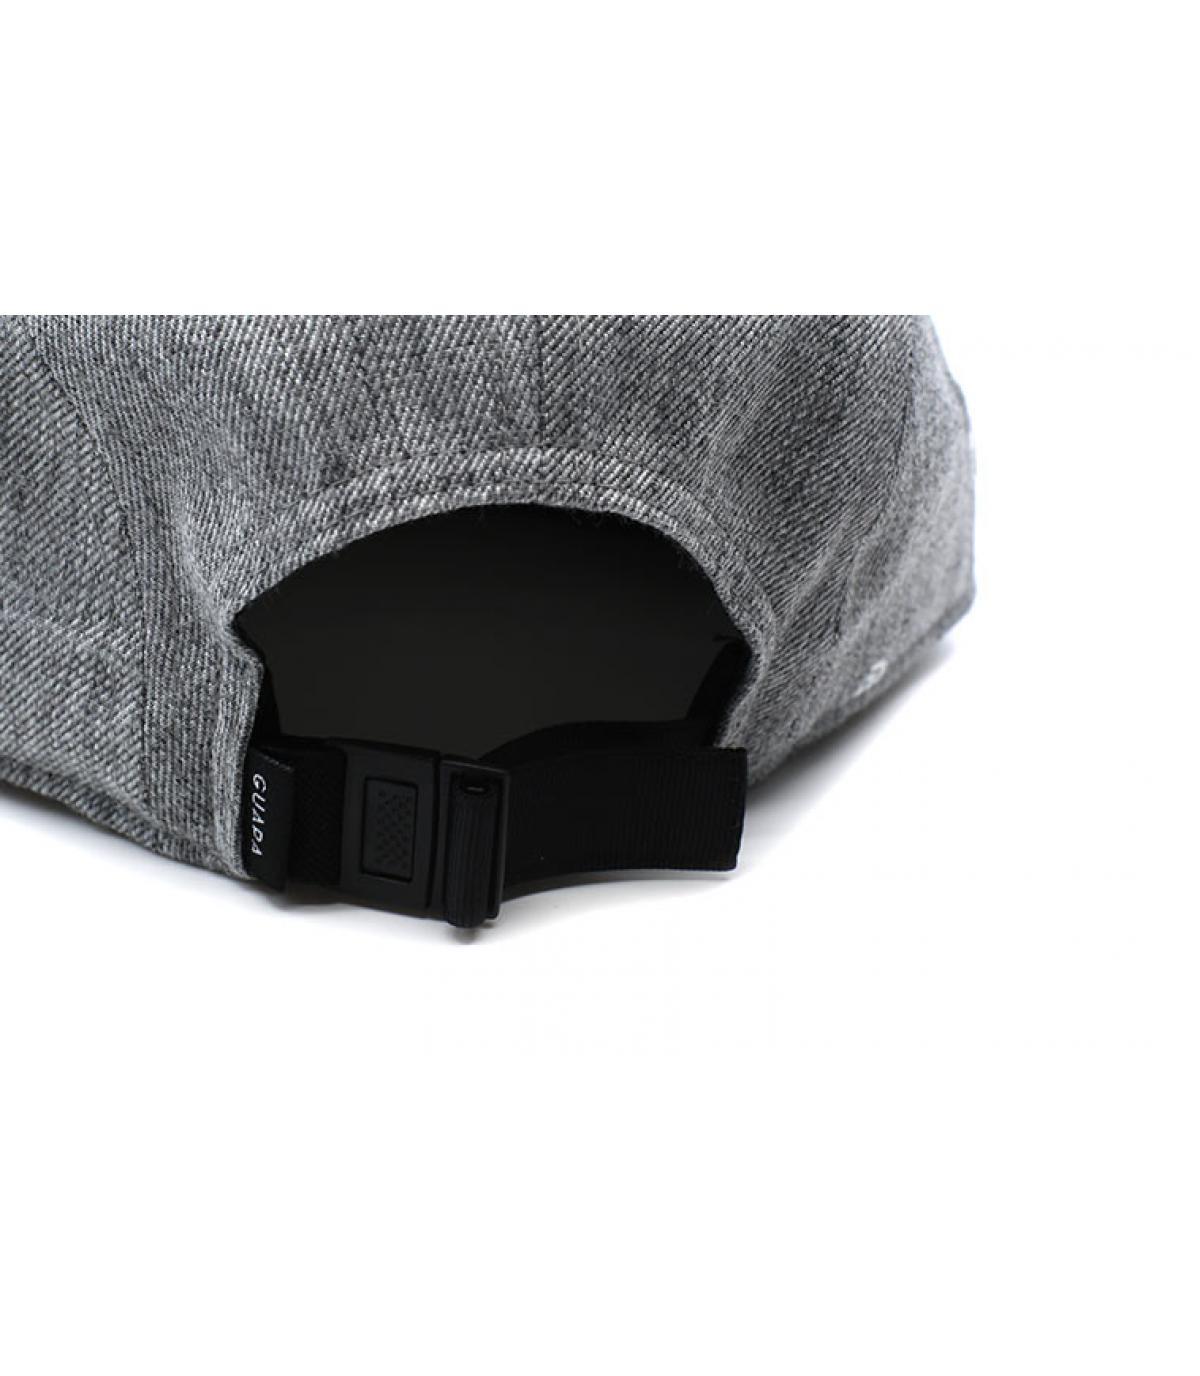 Dettagli Volley 5 Panel heather grey - image 6